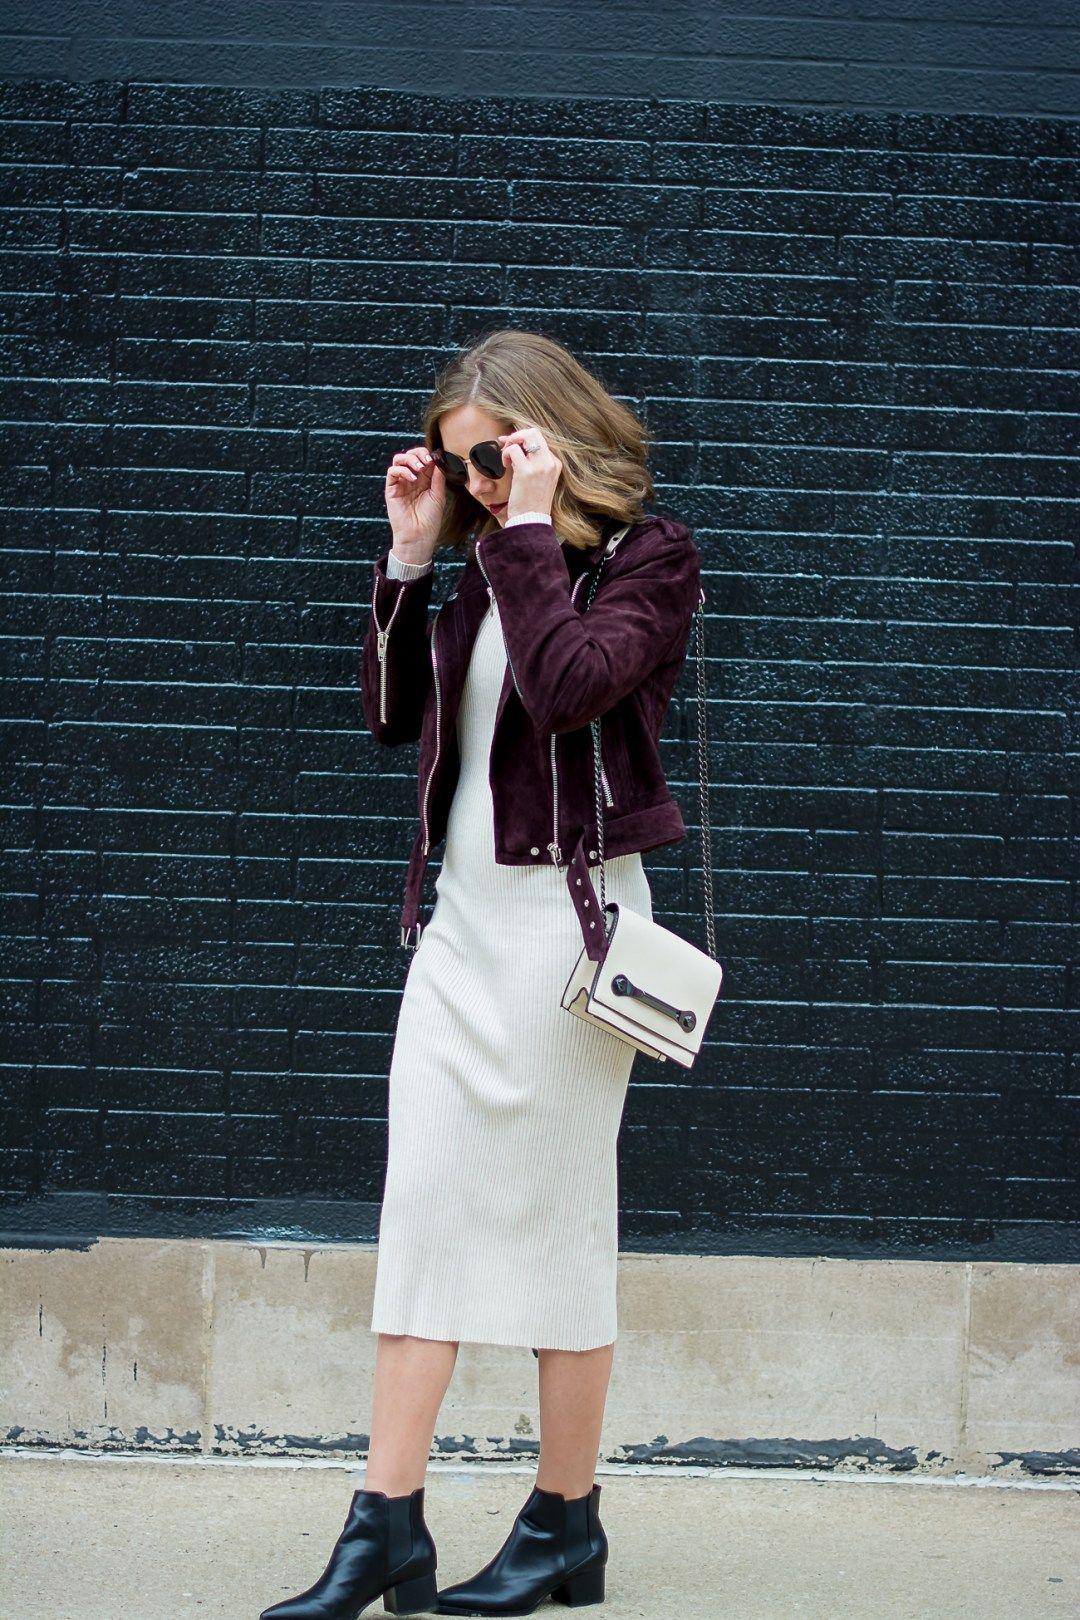 34ec611d zara-rib-knit-bodycon-midi-dress-blank-nyc-burgundy-suede-moto -jacket-forever-21-cream-crossbody-black-pointed-justfab-ankle-boots